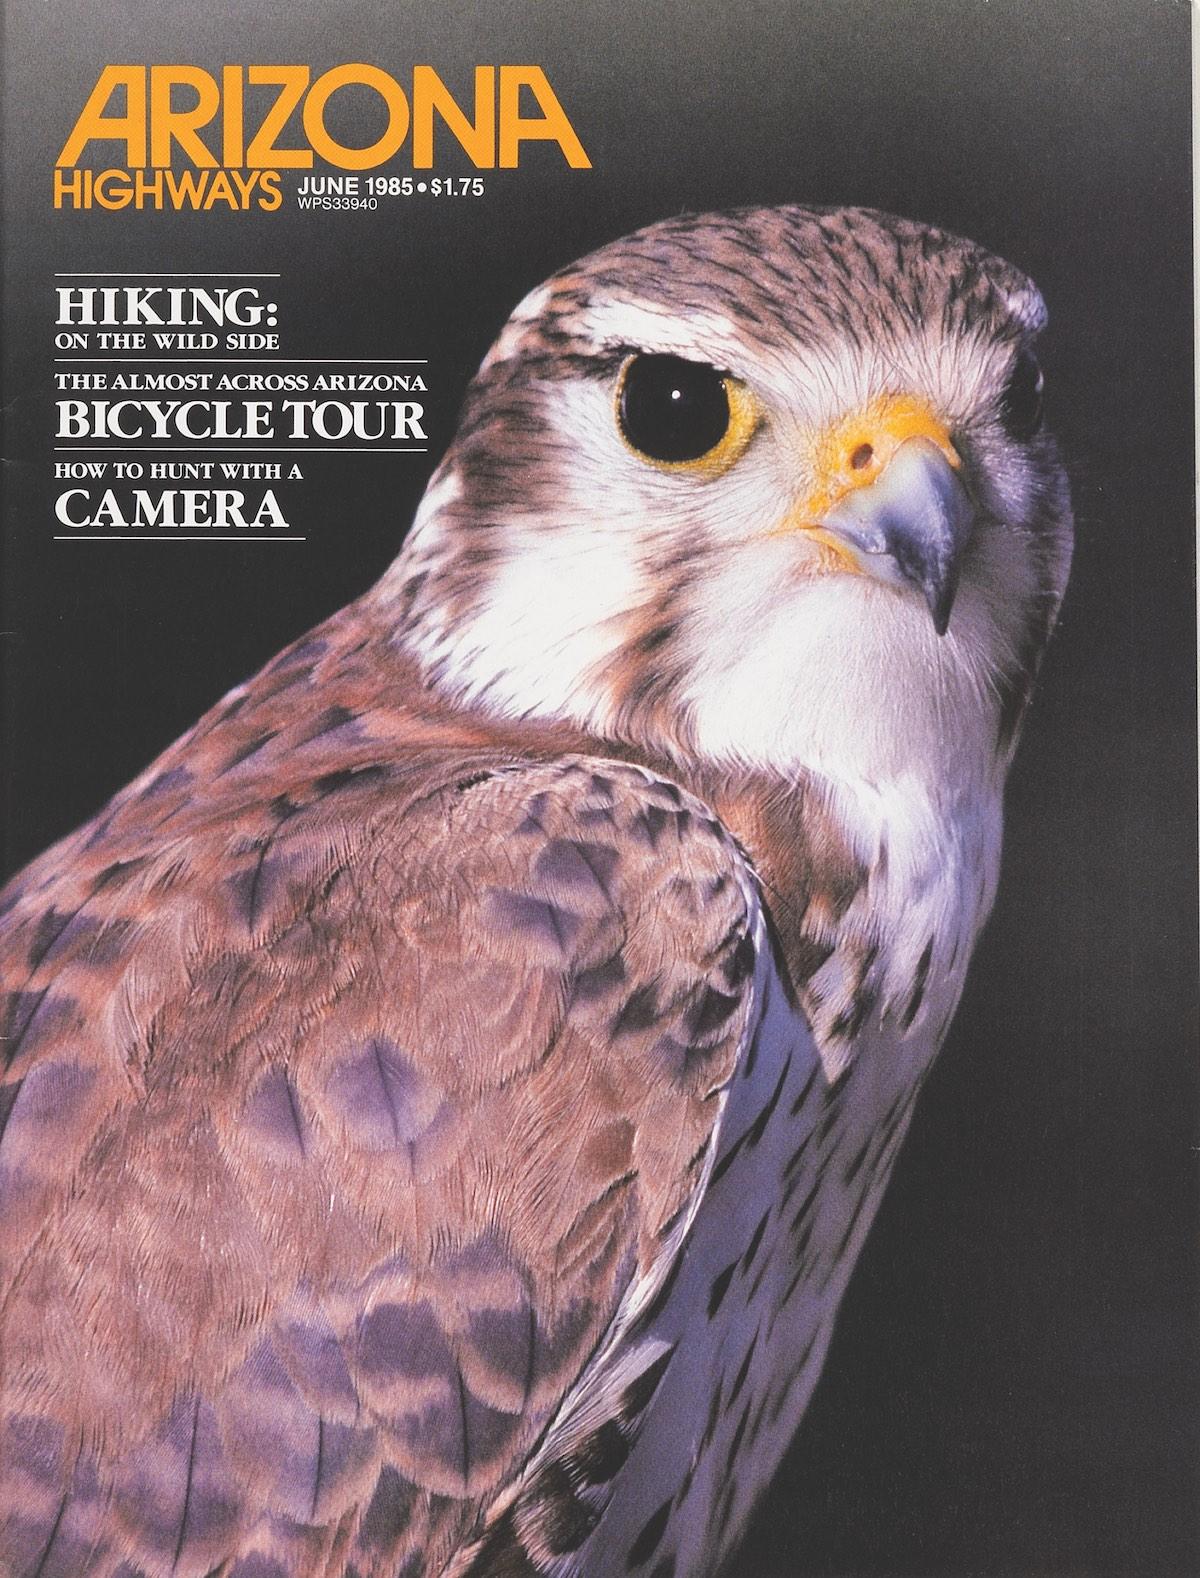 June 1985 cover of Arizona Highways